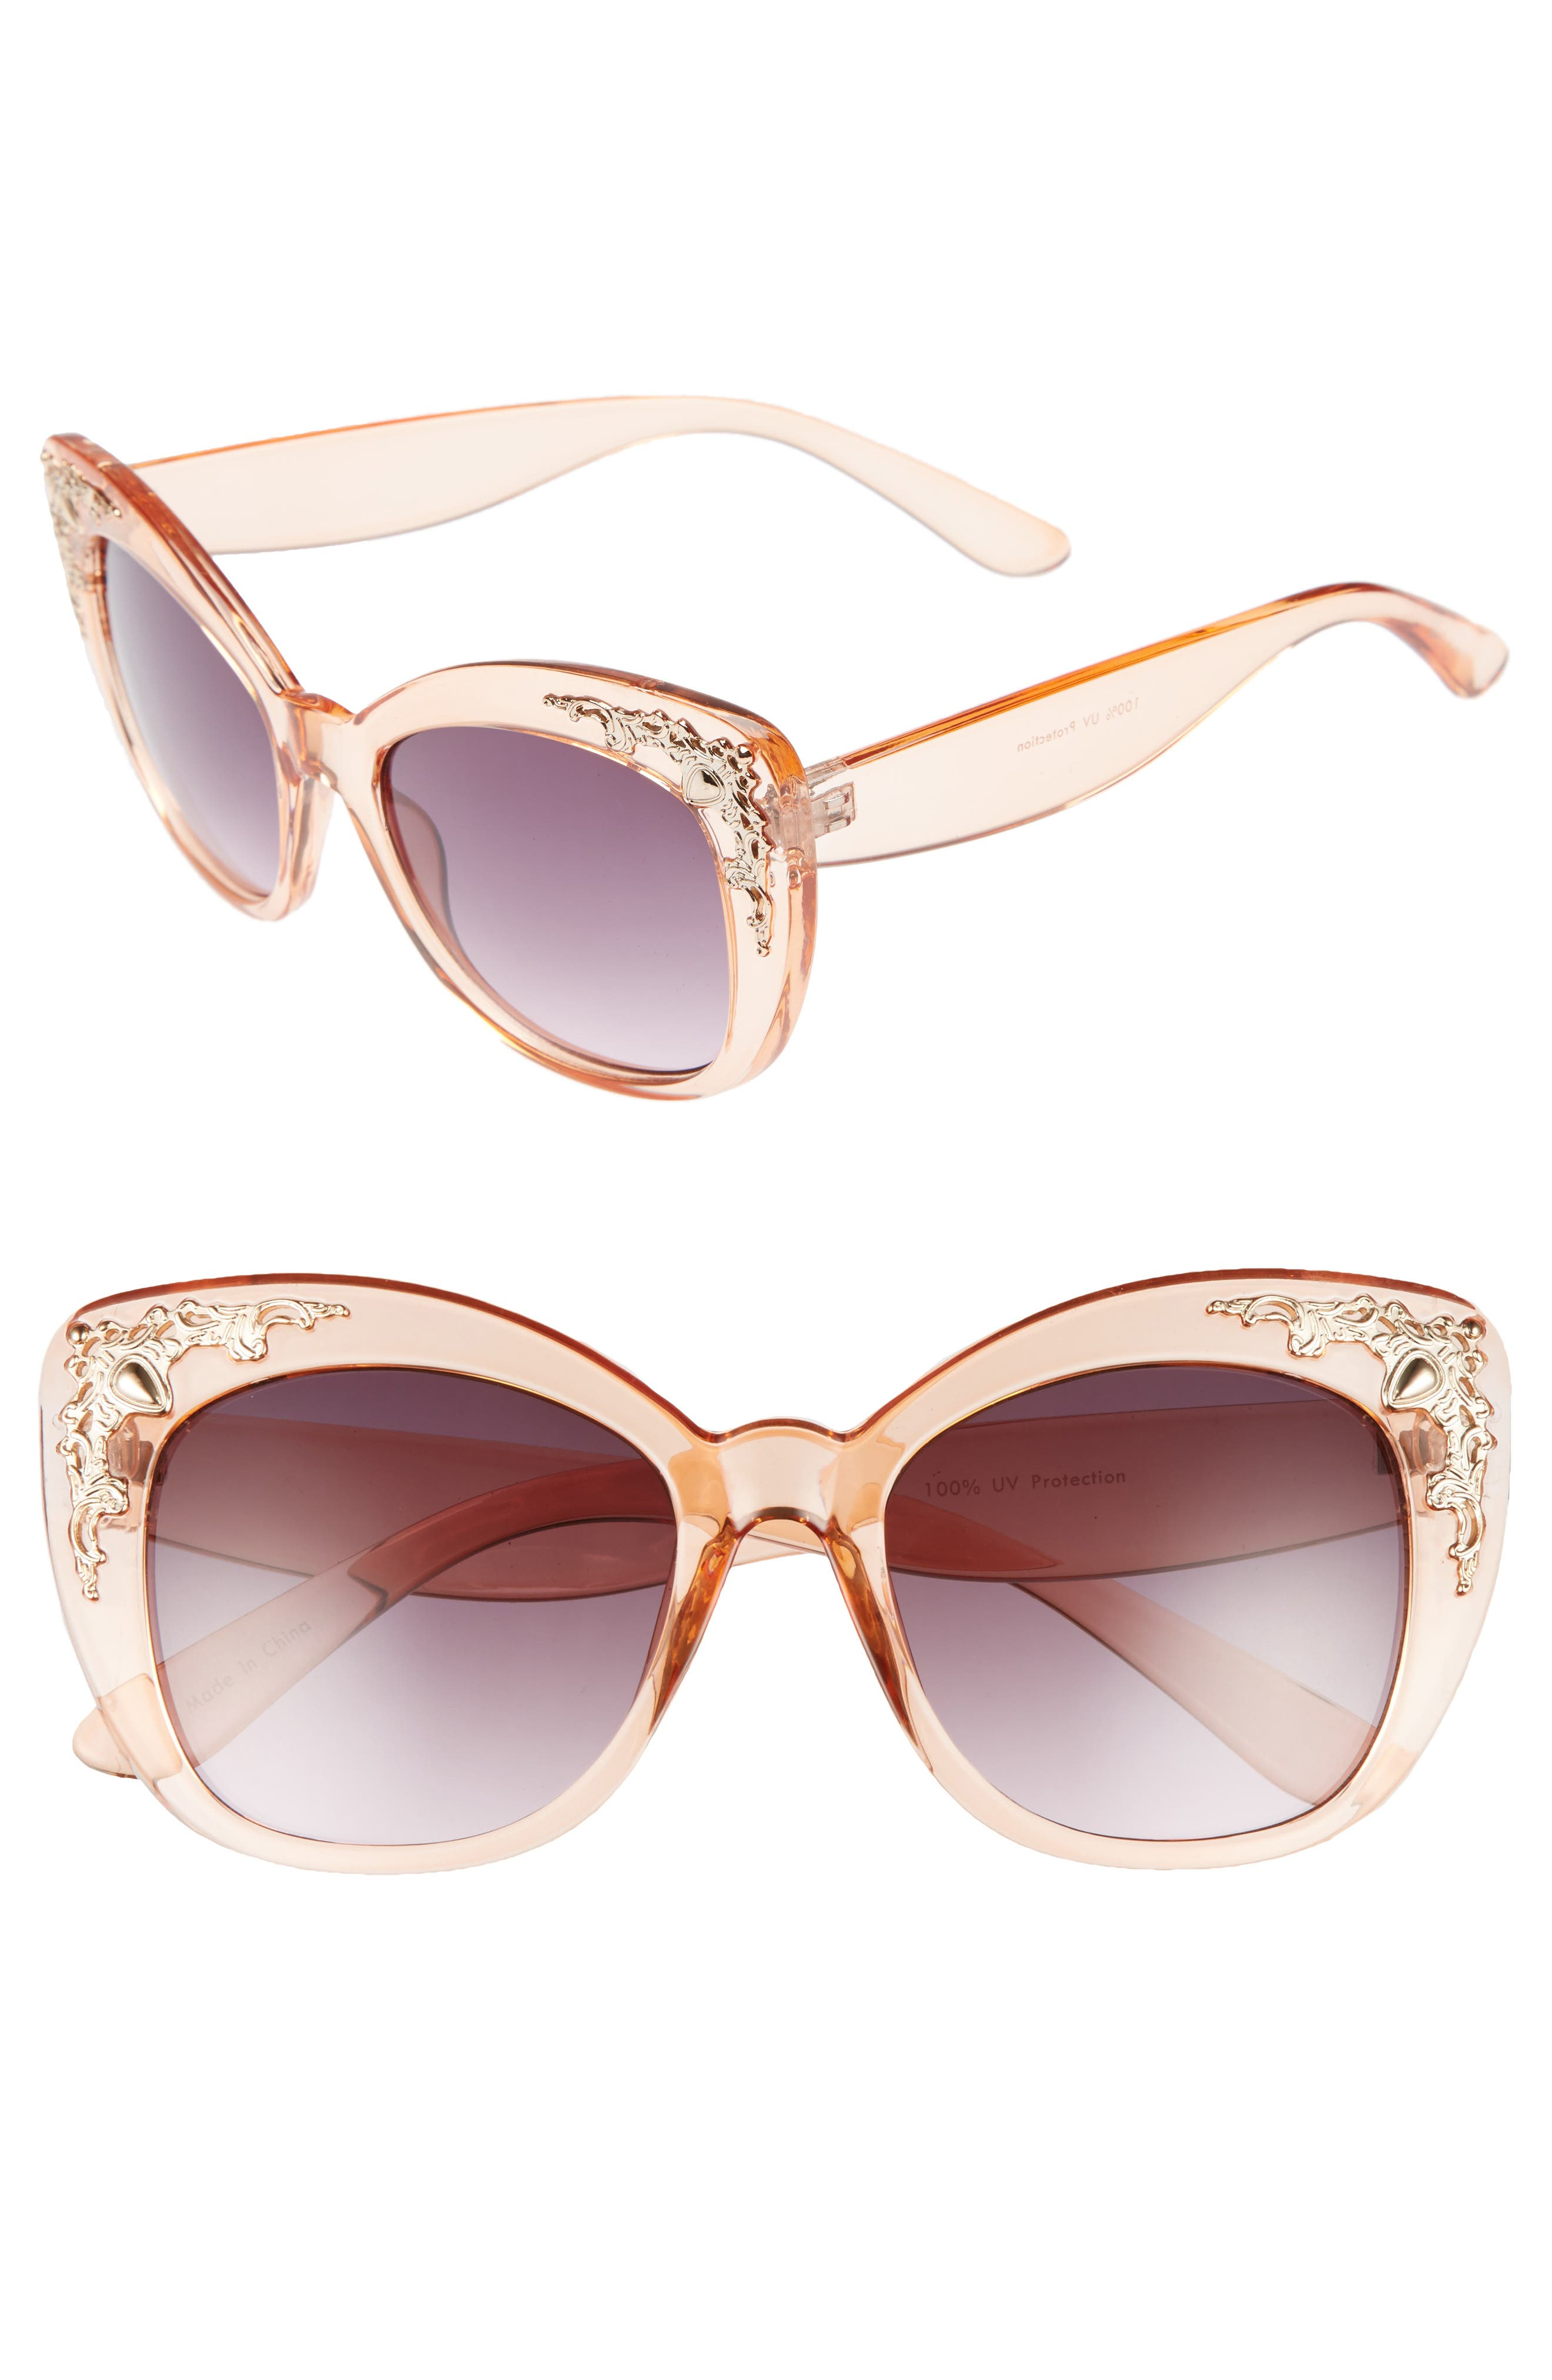 Main Image - BP. 54mm Embellished Cat Eye Sunglasses